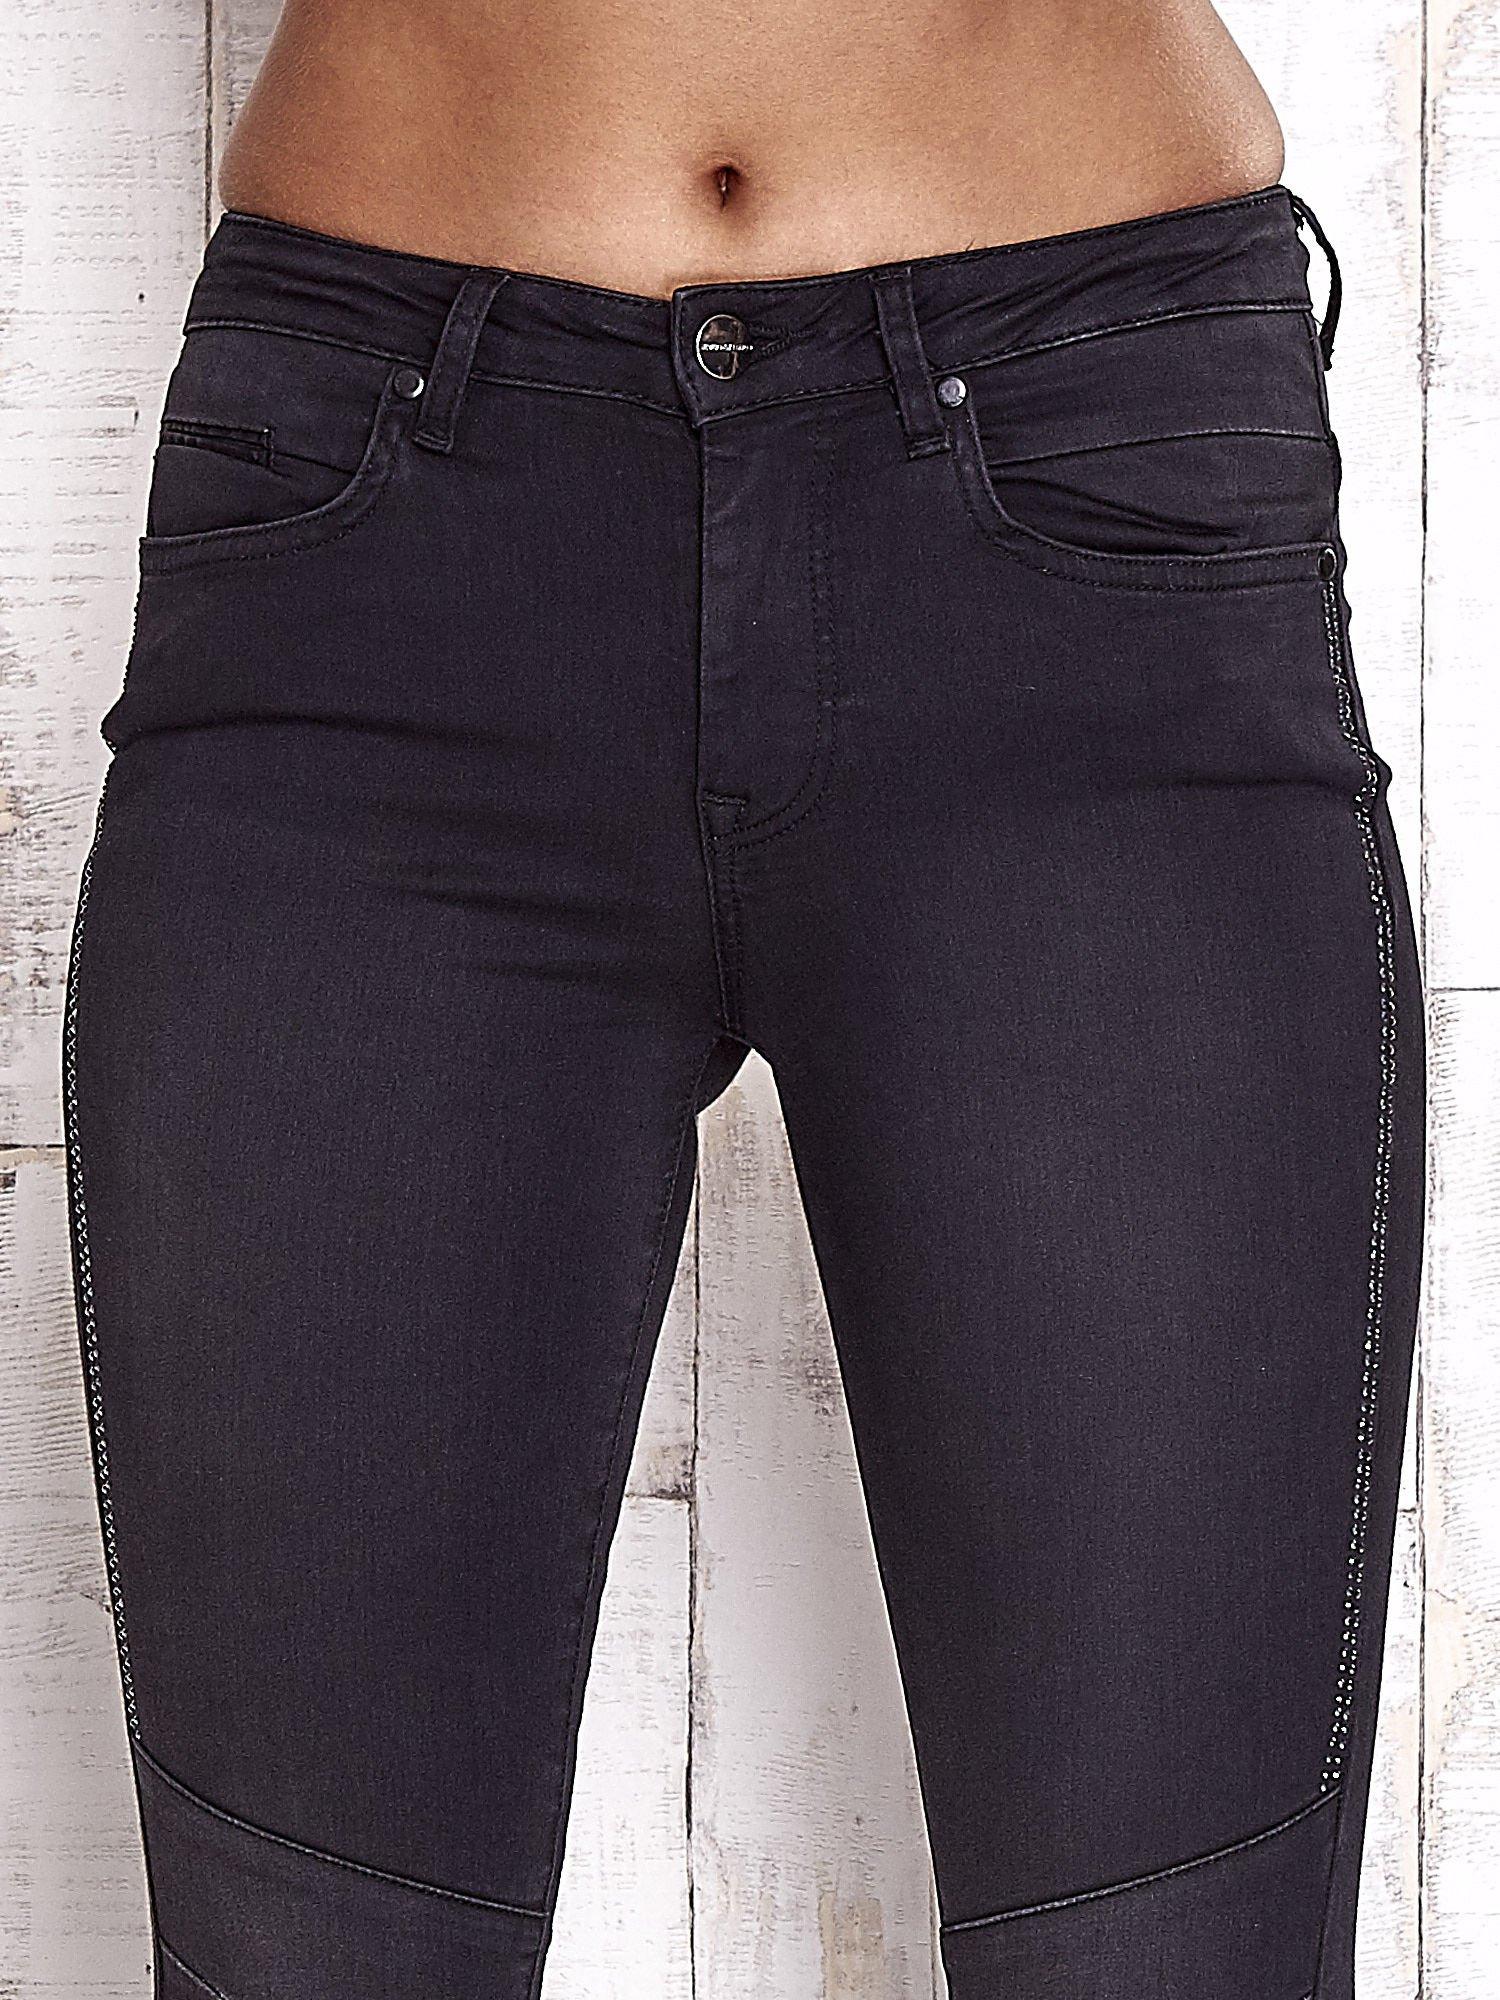 TOM TAILOR Czarne spodnie skinny jeans z dżetami                                  zdj.                                  4